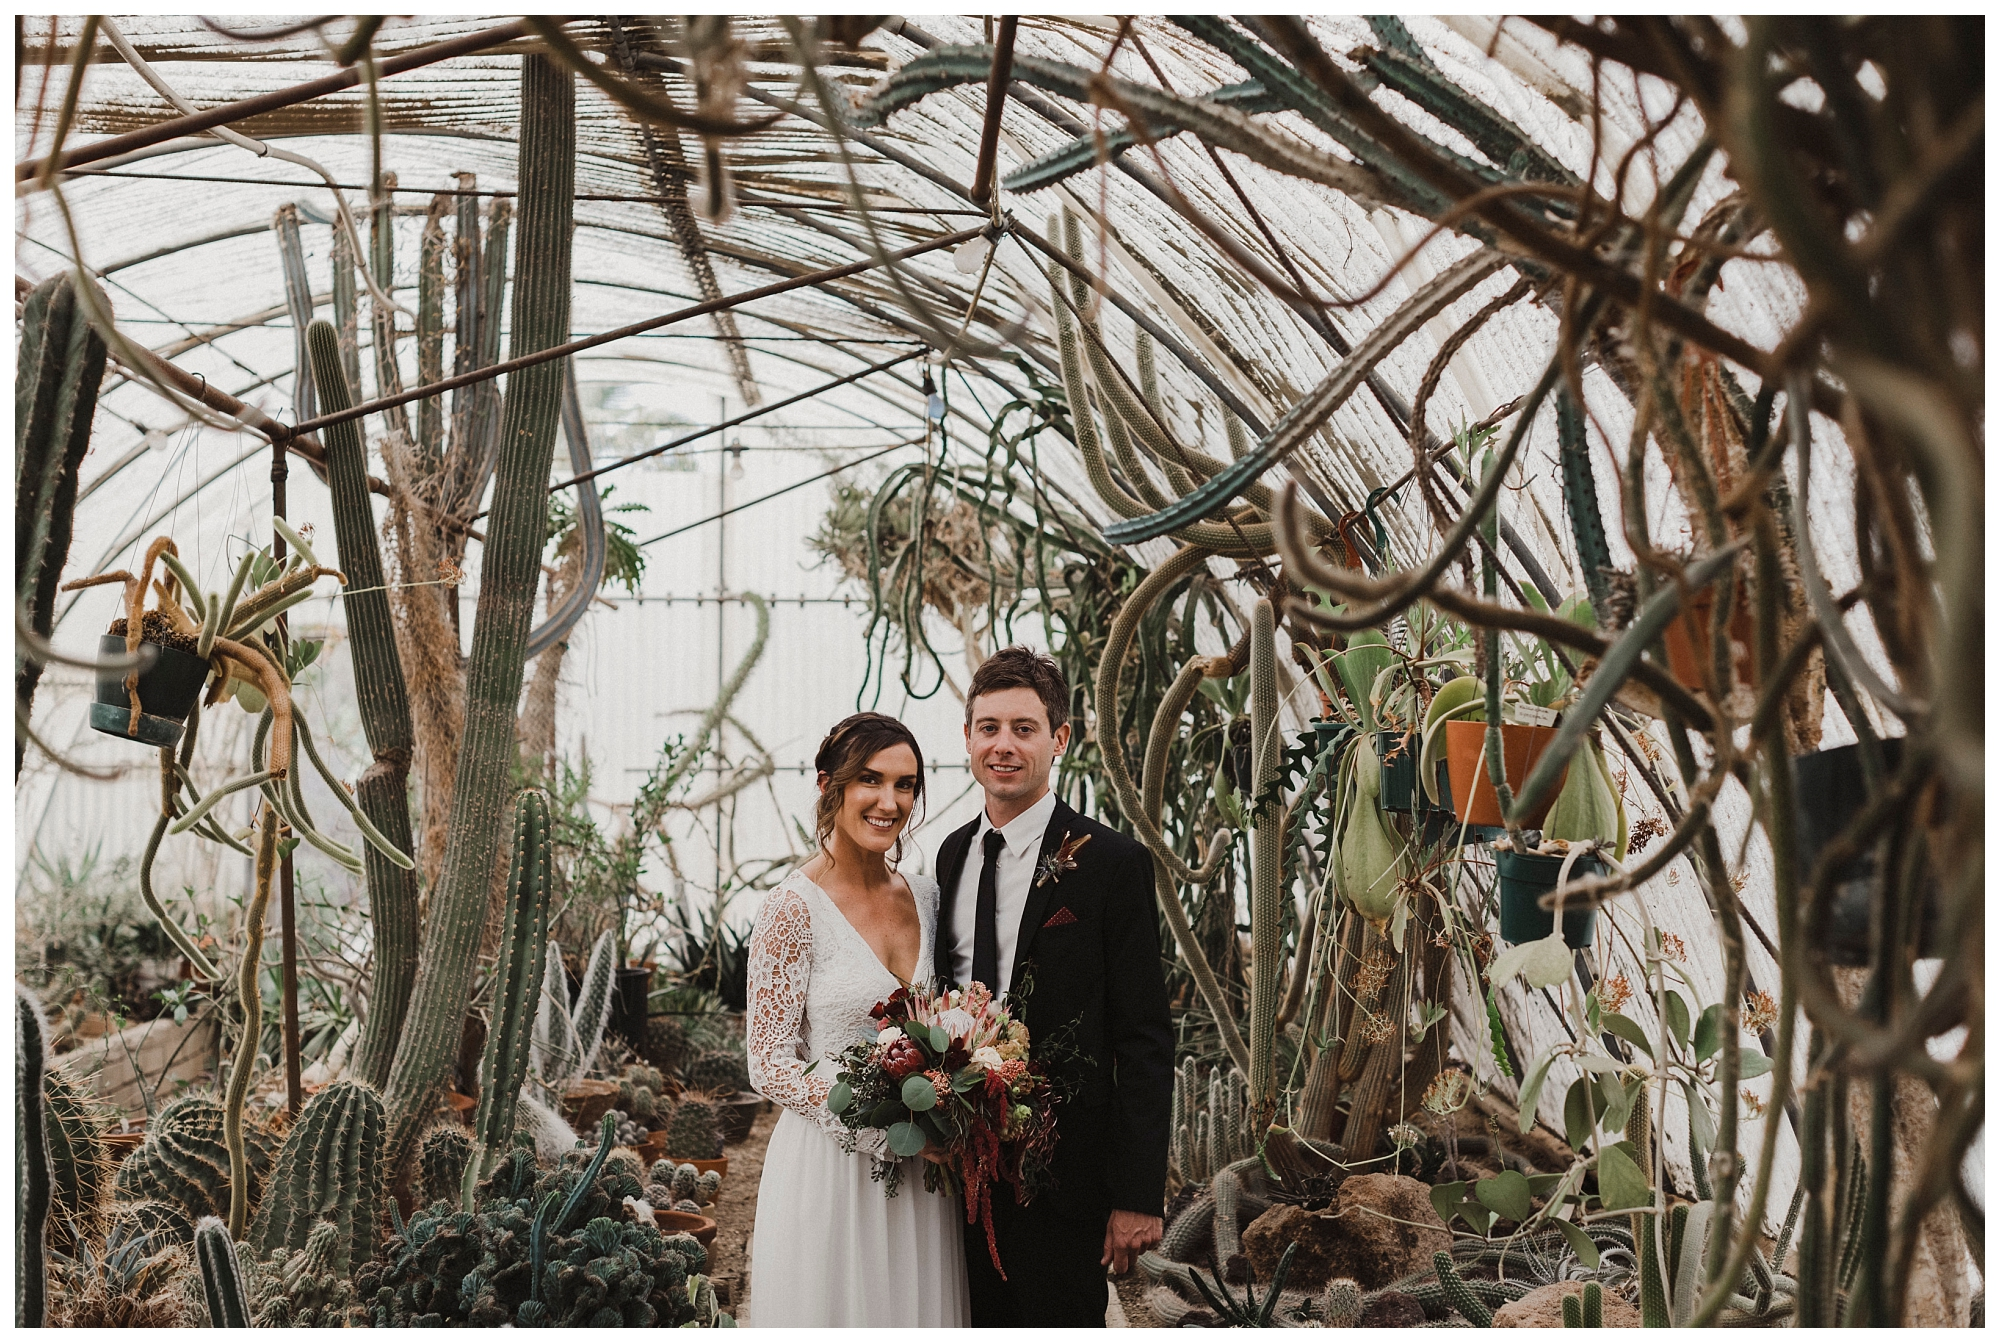 Ace Hotel Wedding Palm Springs (25).jpg